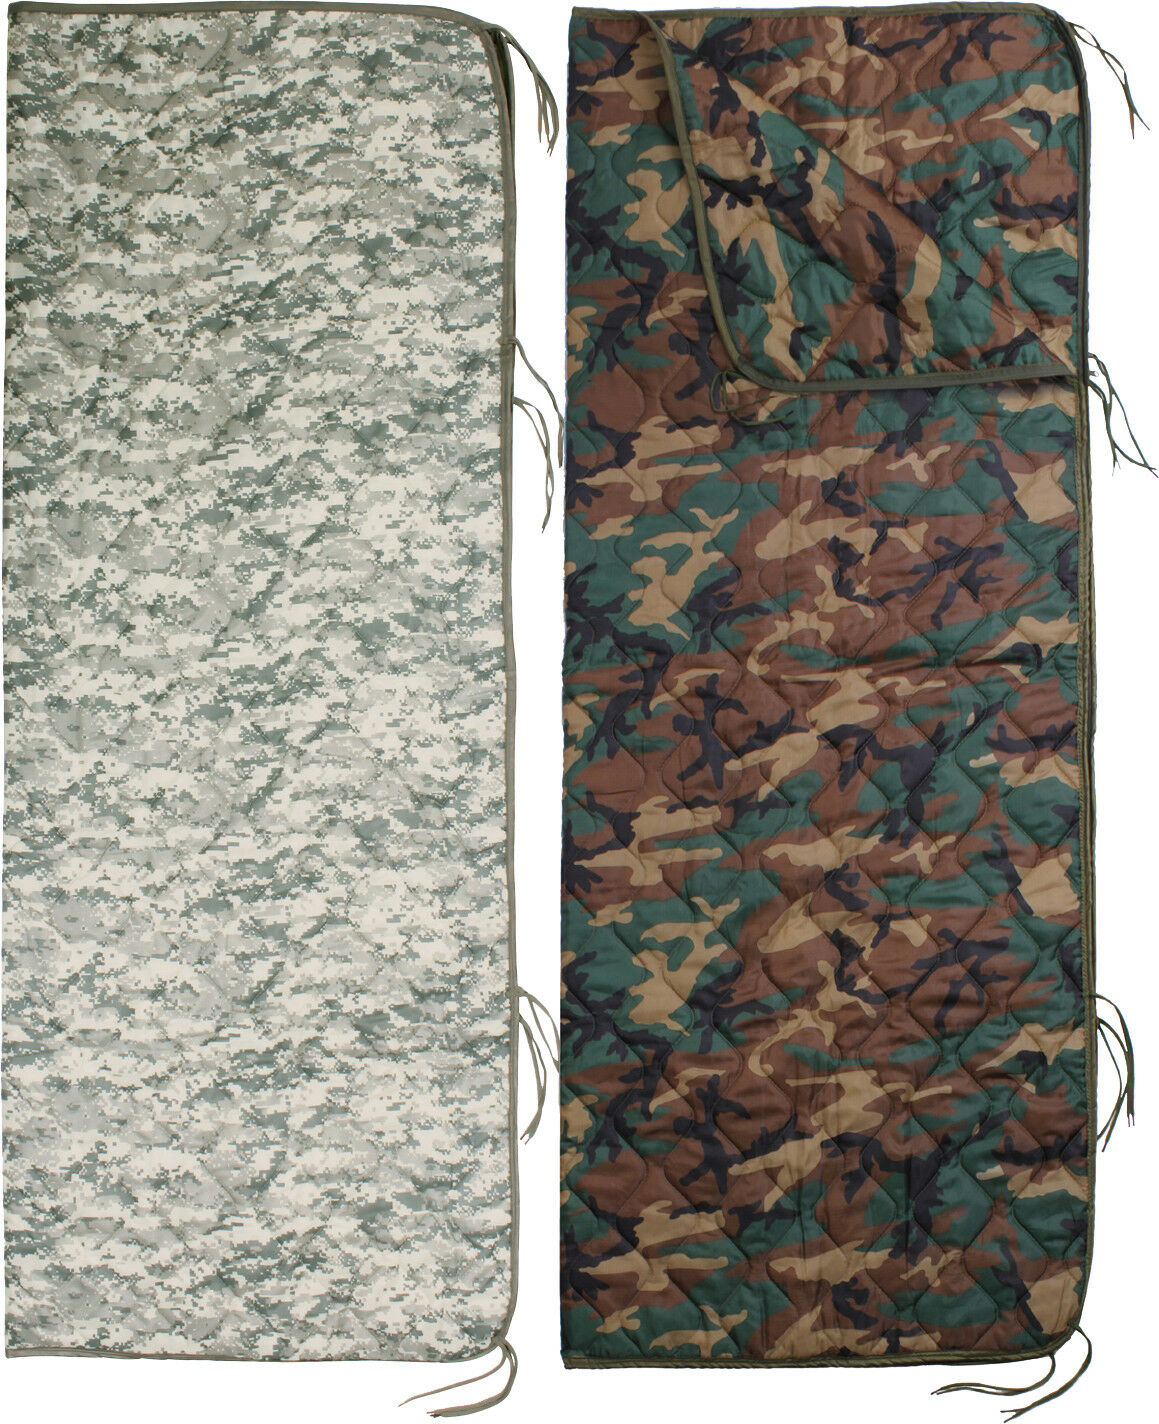 Digital Camouflage Zipper Poncho Liner Military Blanket Army Woobie 62  x 82